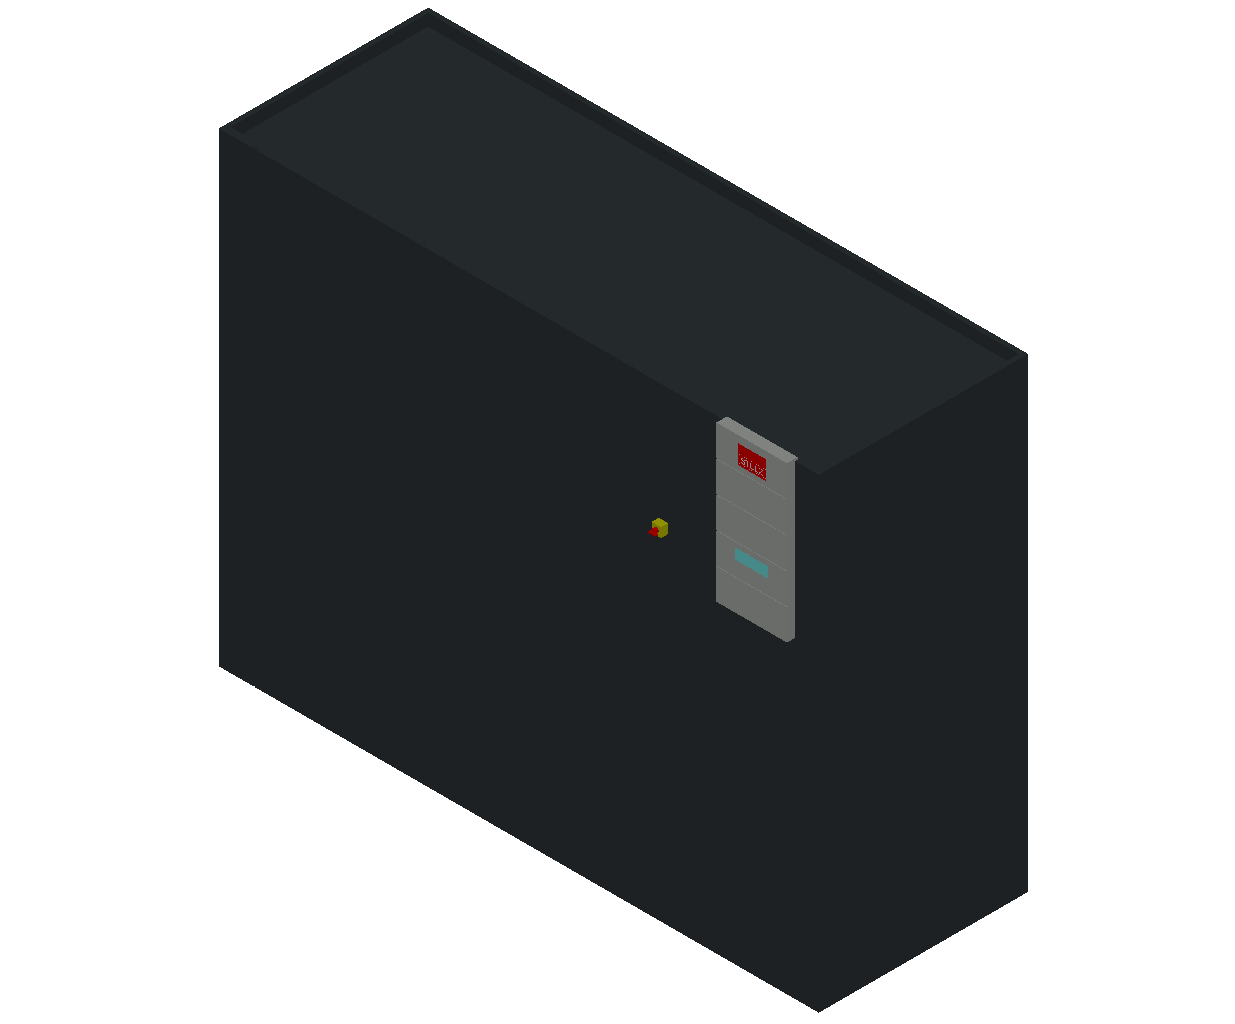 HC_Air Conditioner_Indoor Unit_MEPcontent_STULZ_CyberAir 3PRO_ALD_Dual Circuit GES_ALD_772_GES_INT-EN.dwg